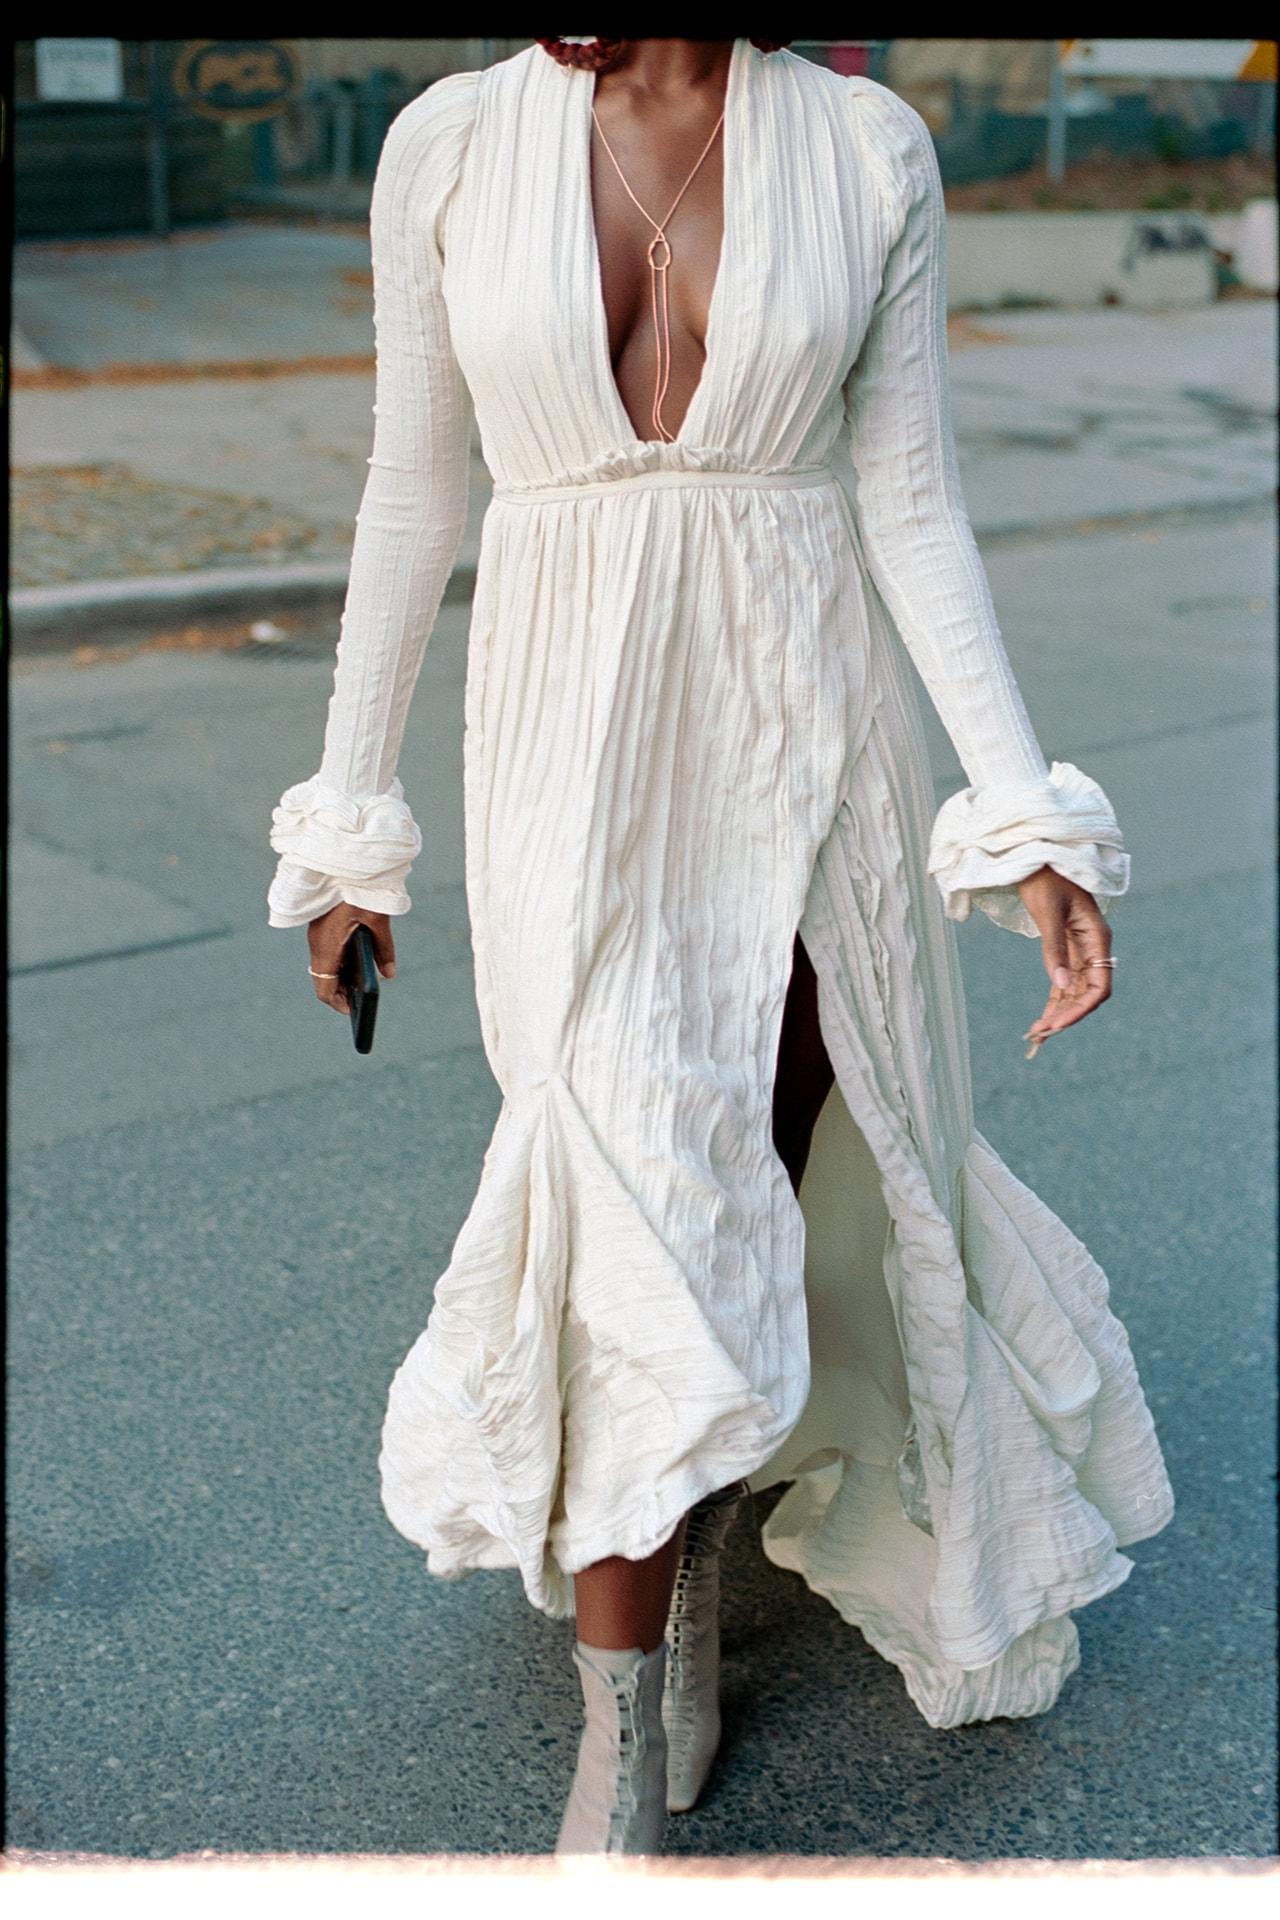 SOTO Bridal Wear Bridalwear Marque Robe de mariée Robes Fashion-Forward Brides Modern Gowns Latinx Inspired Founders Enrique Boni Unbridled Collection